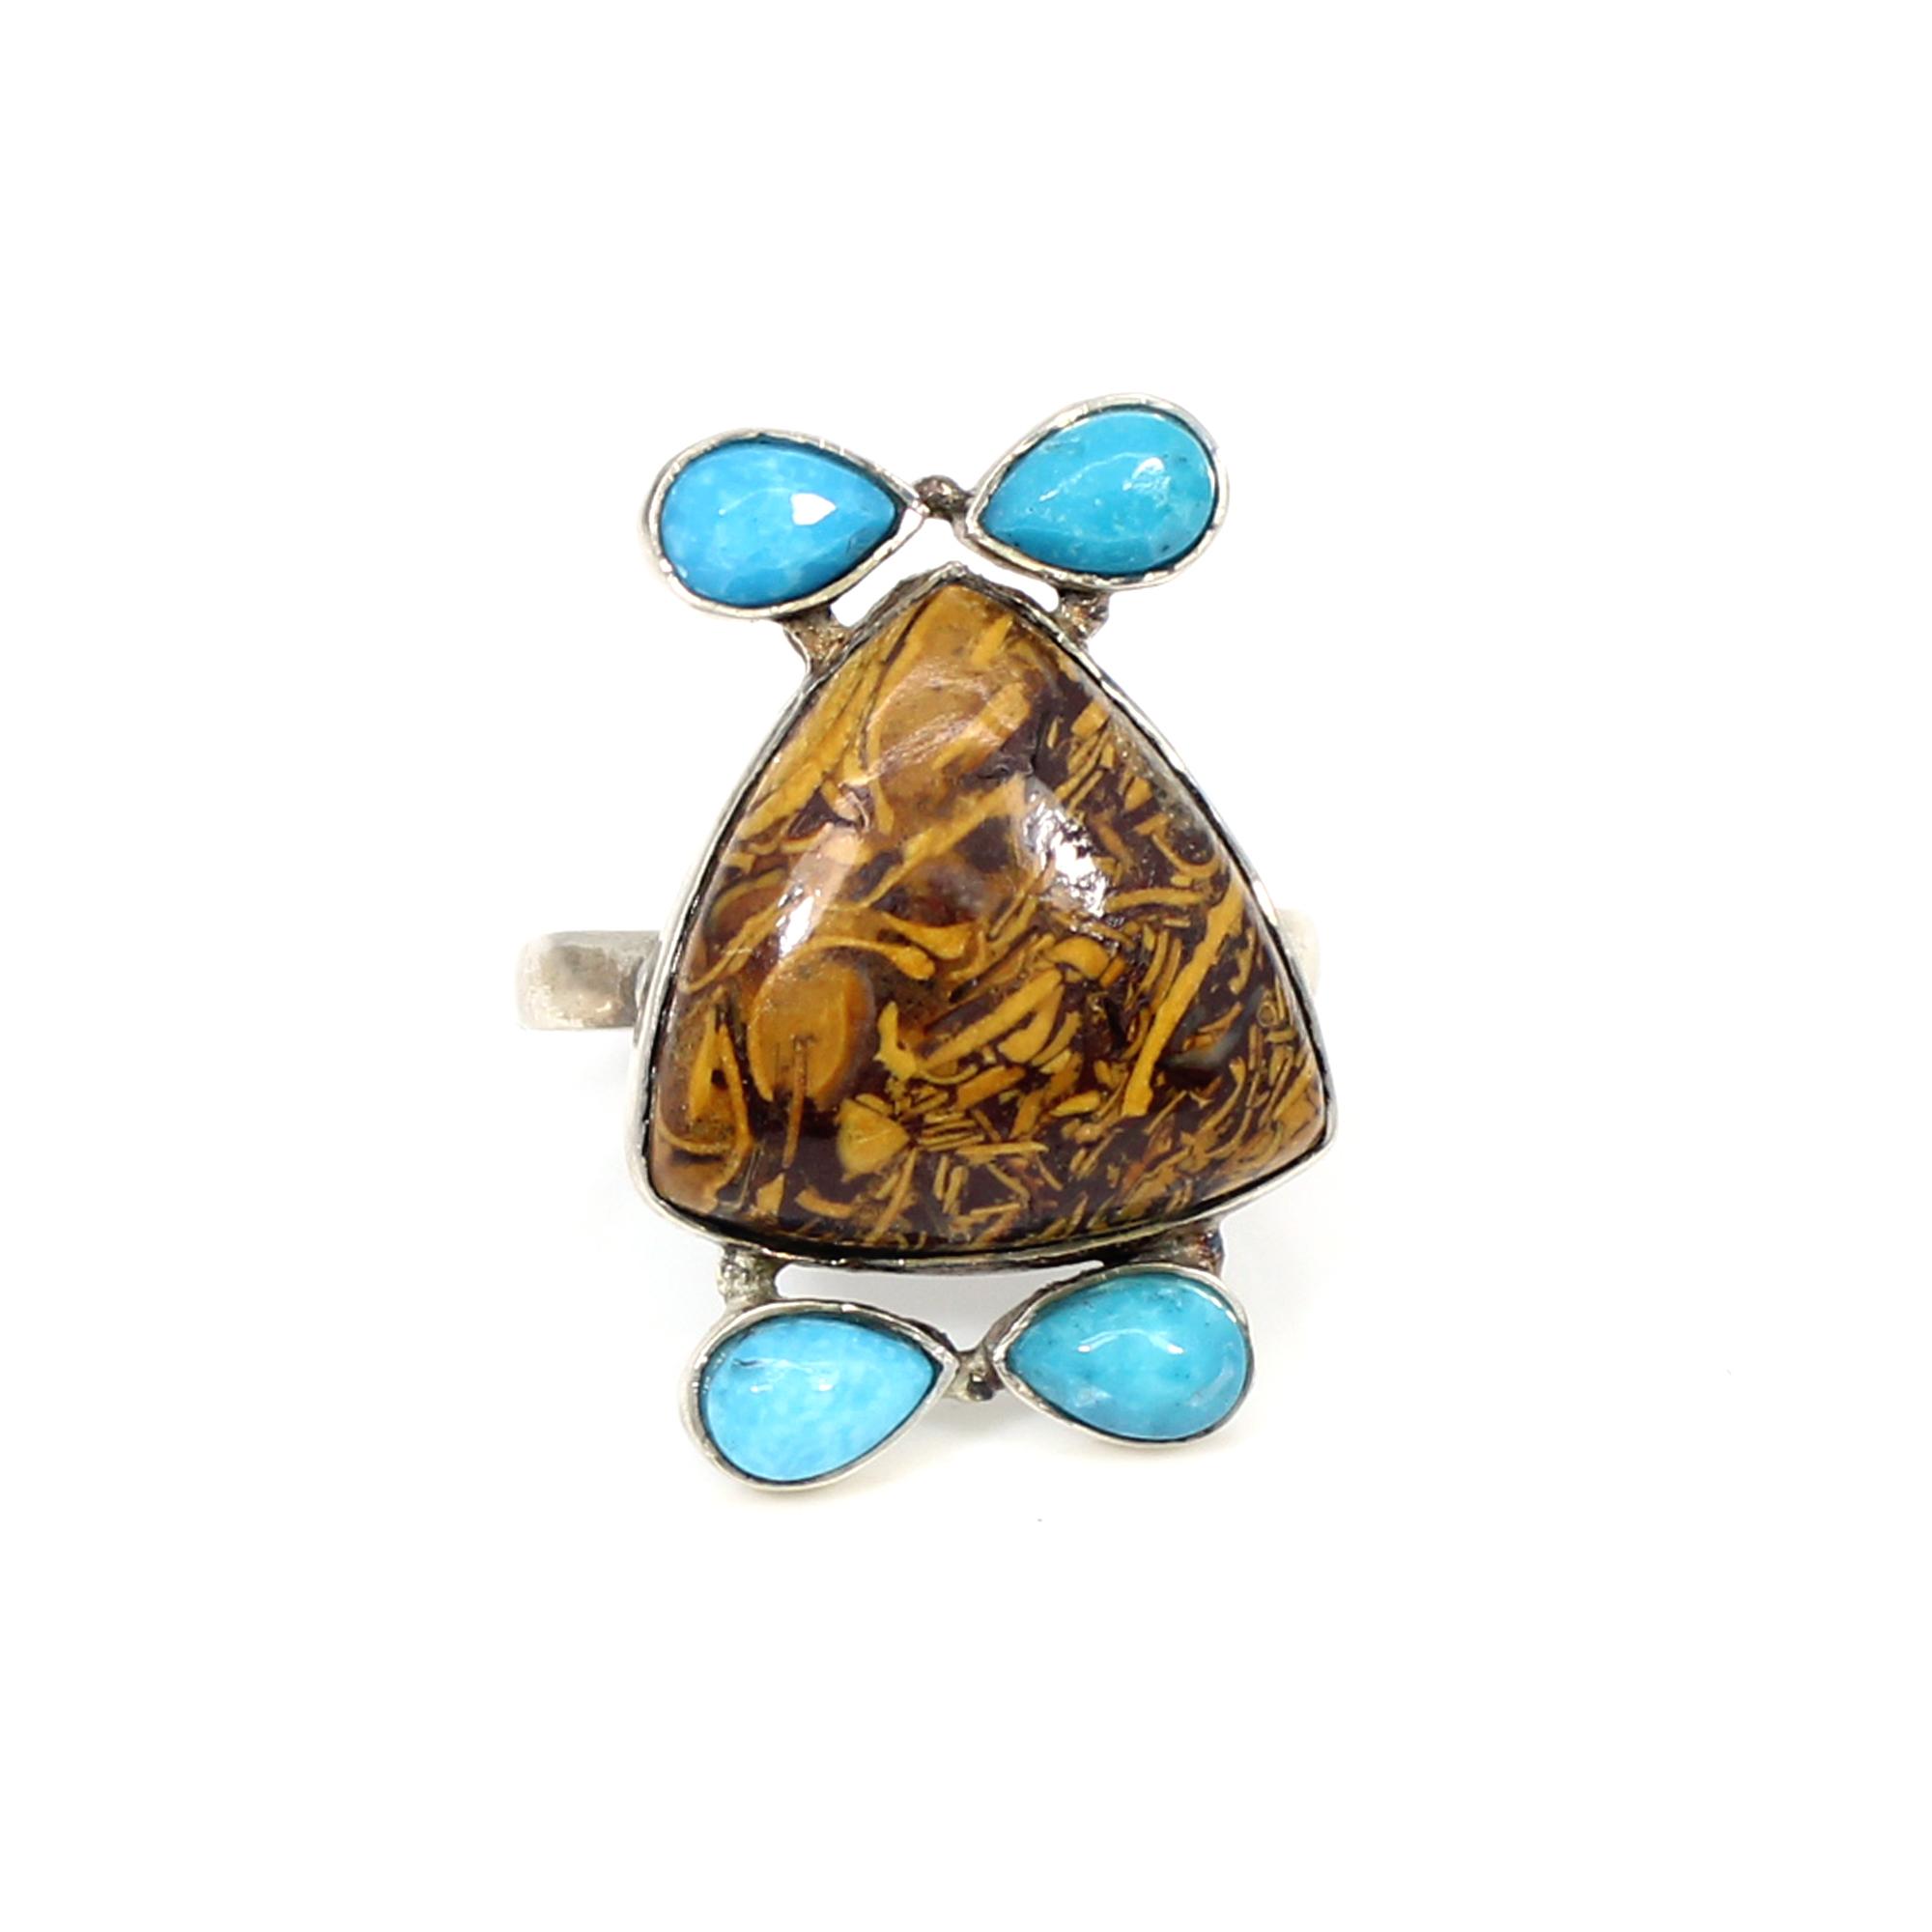 New Arrival Natural Mariam Jasper & Blue Turquoise Gemstone Ring Solid 925 Sterling Silver Ring Designer Huge Rings Gift For Him